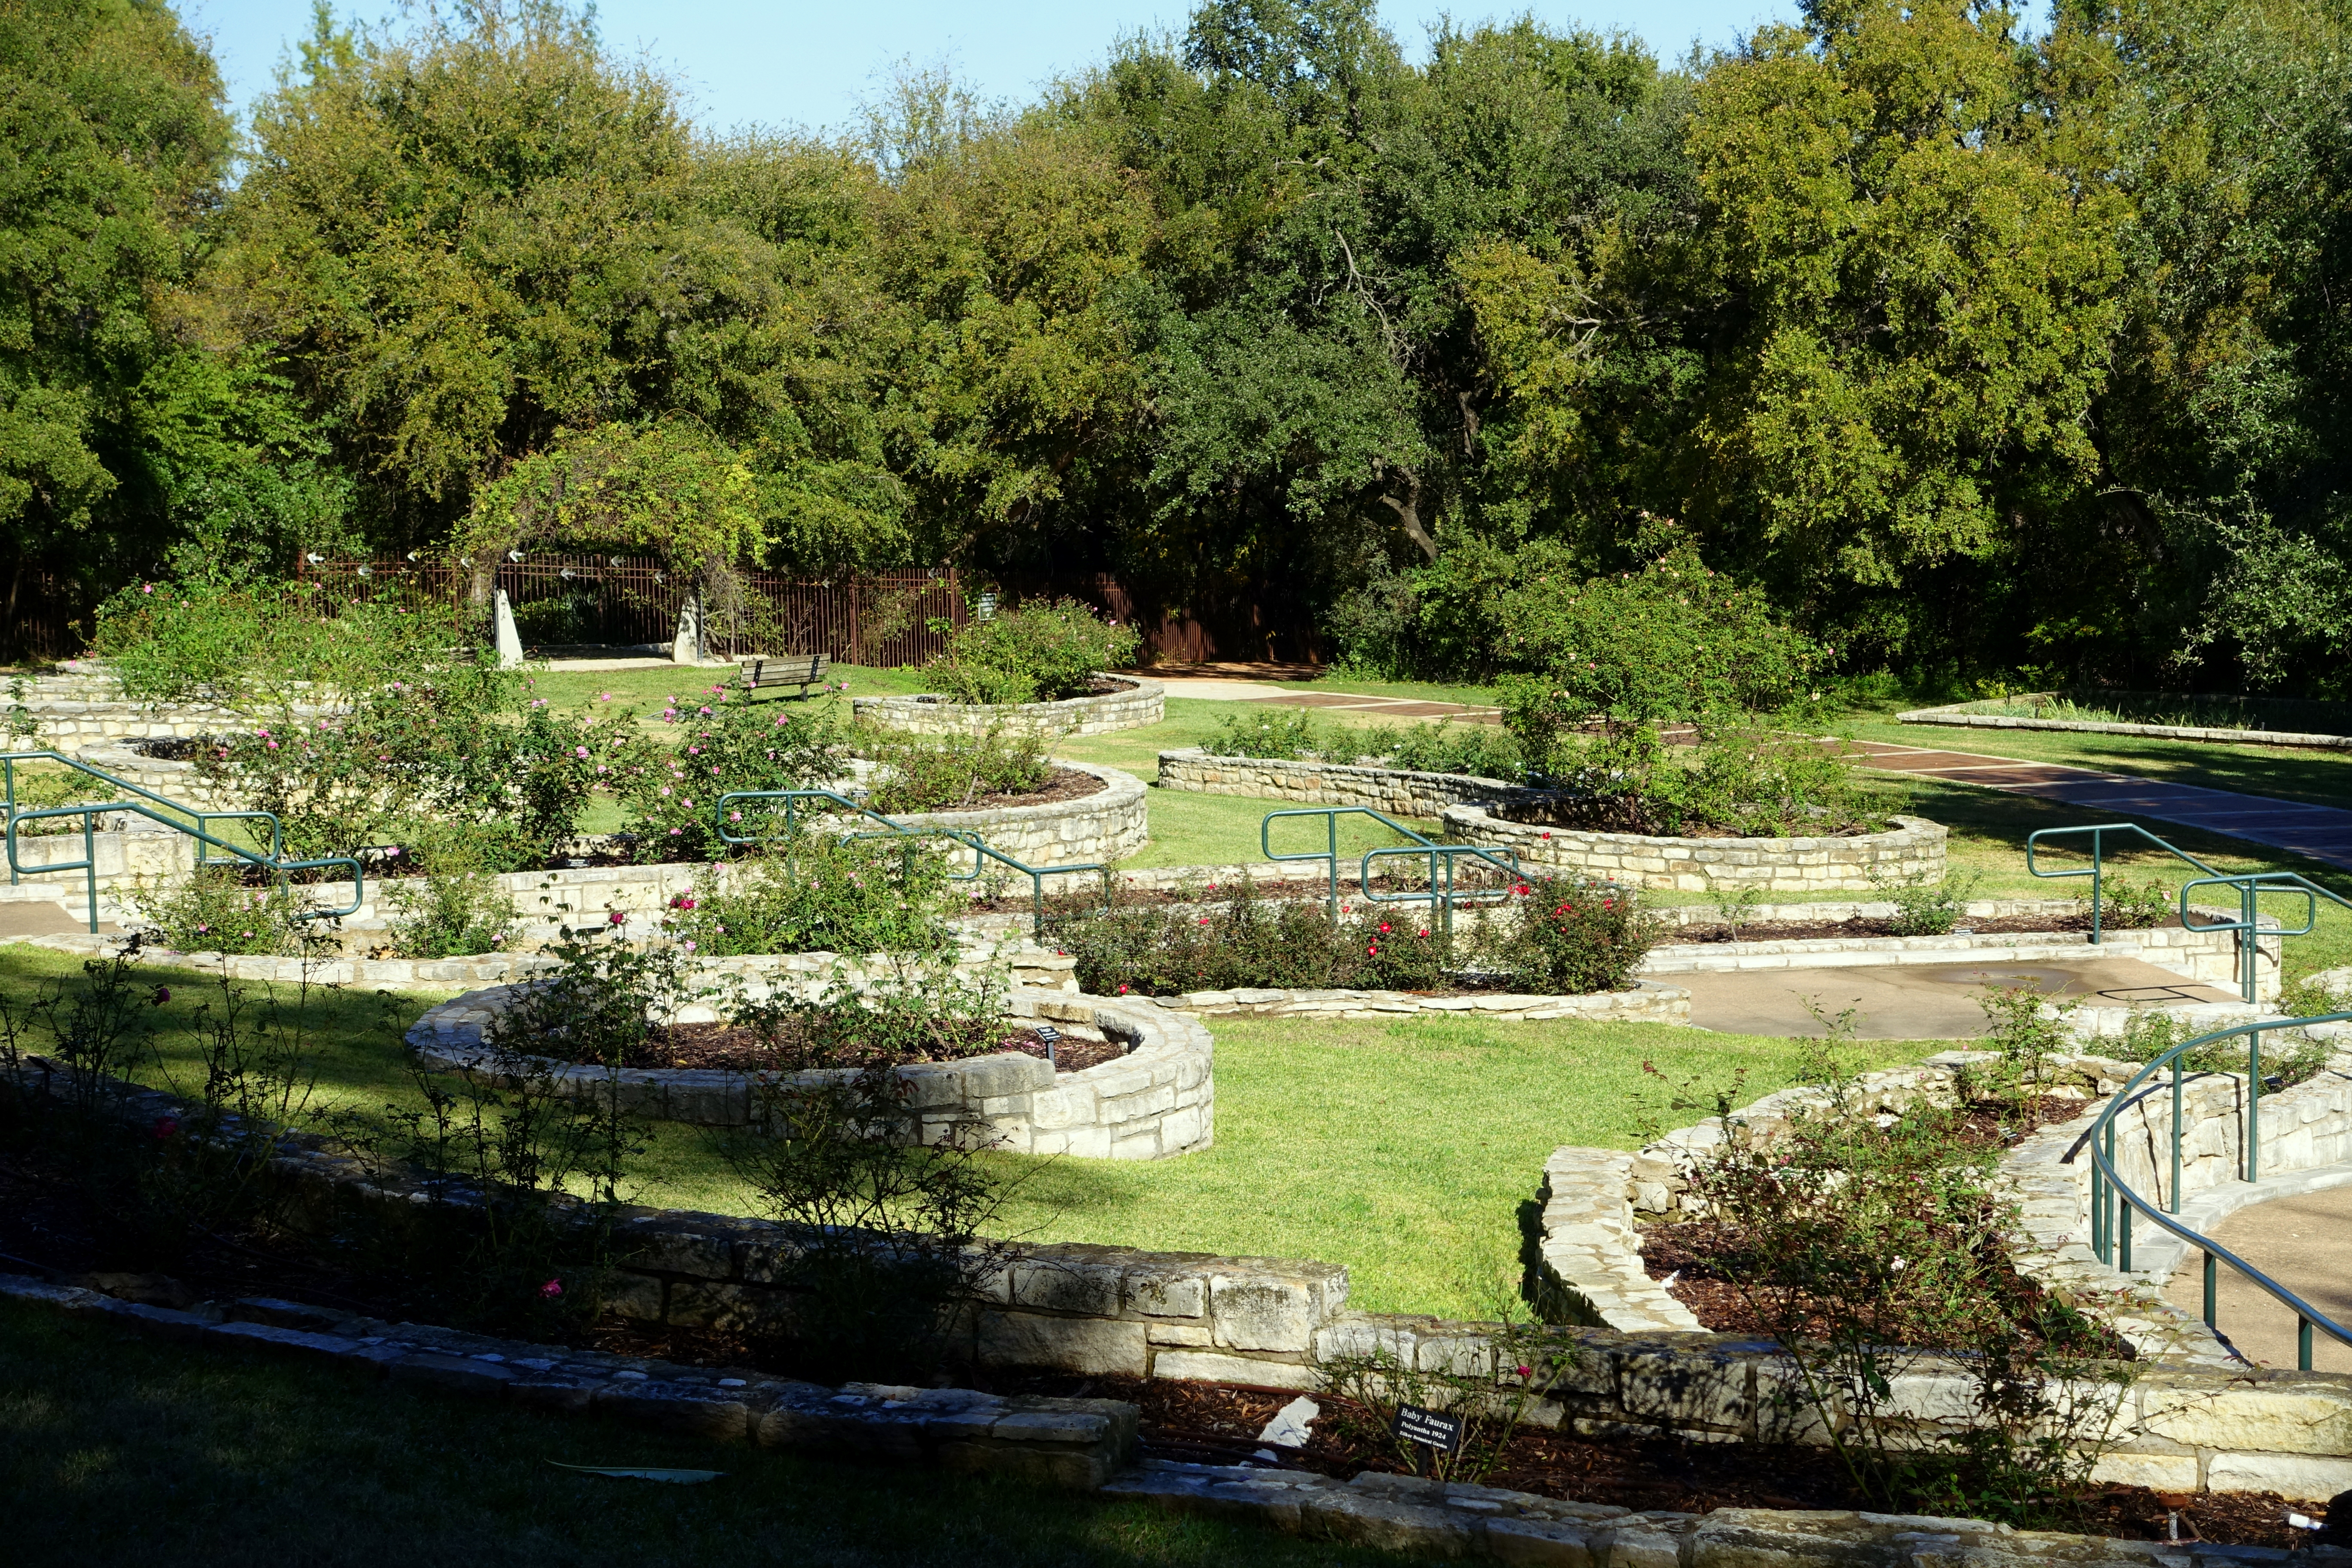 File:Mabel Davis Rose Garden   Zilker Botanical Garden   Austin, Texas    DSC08873